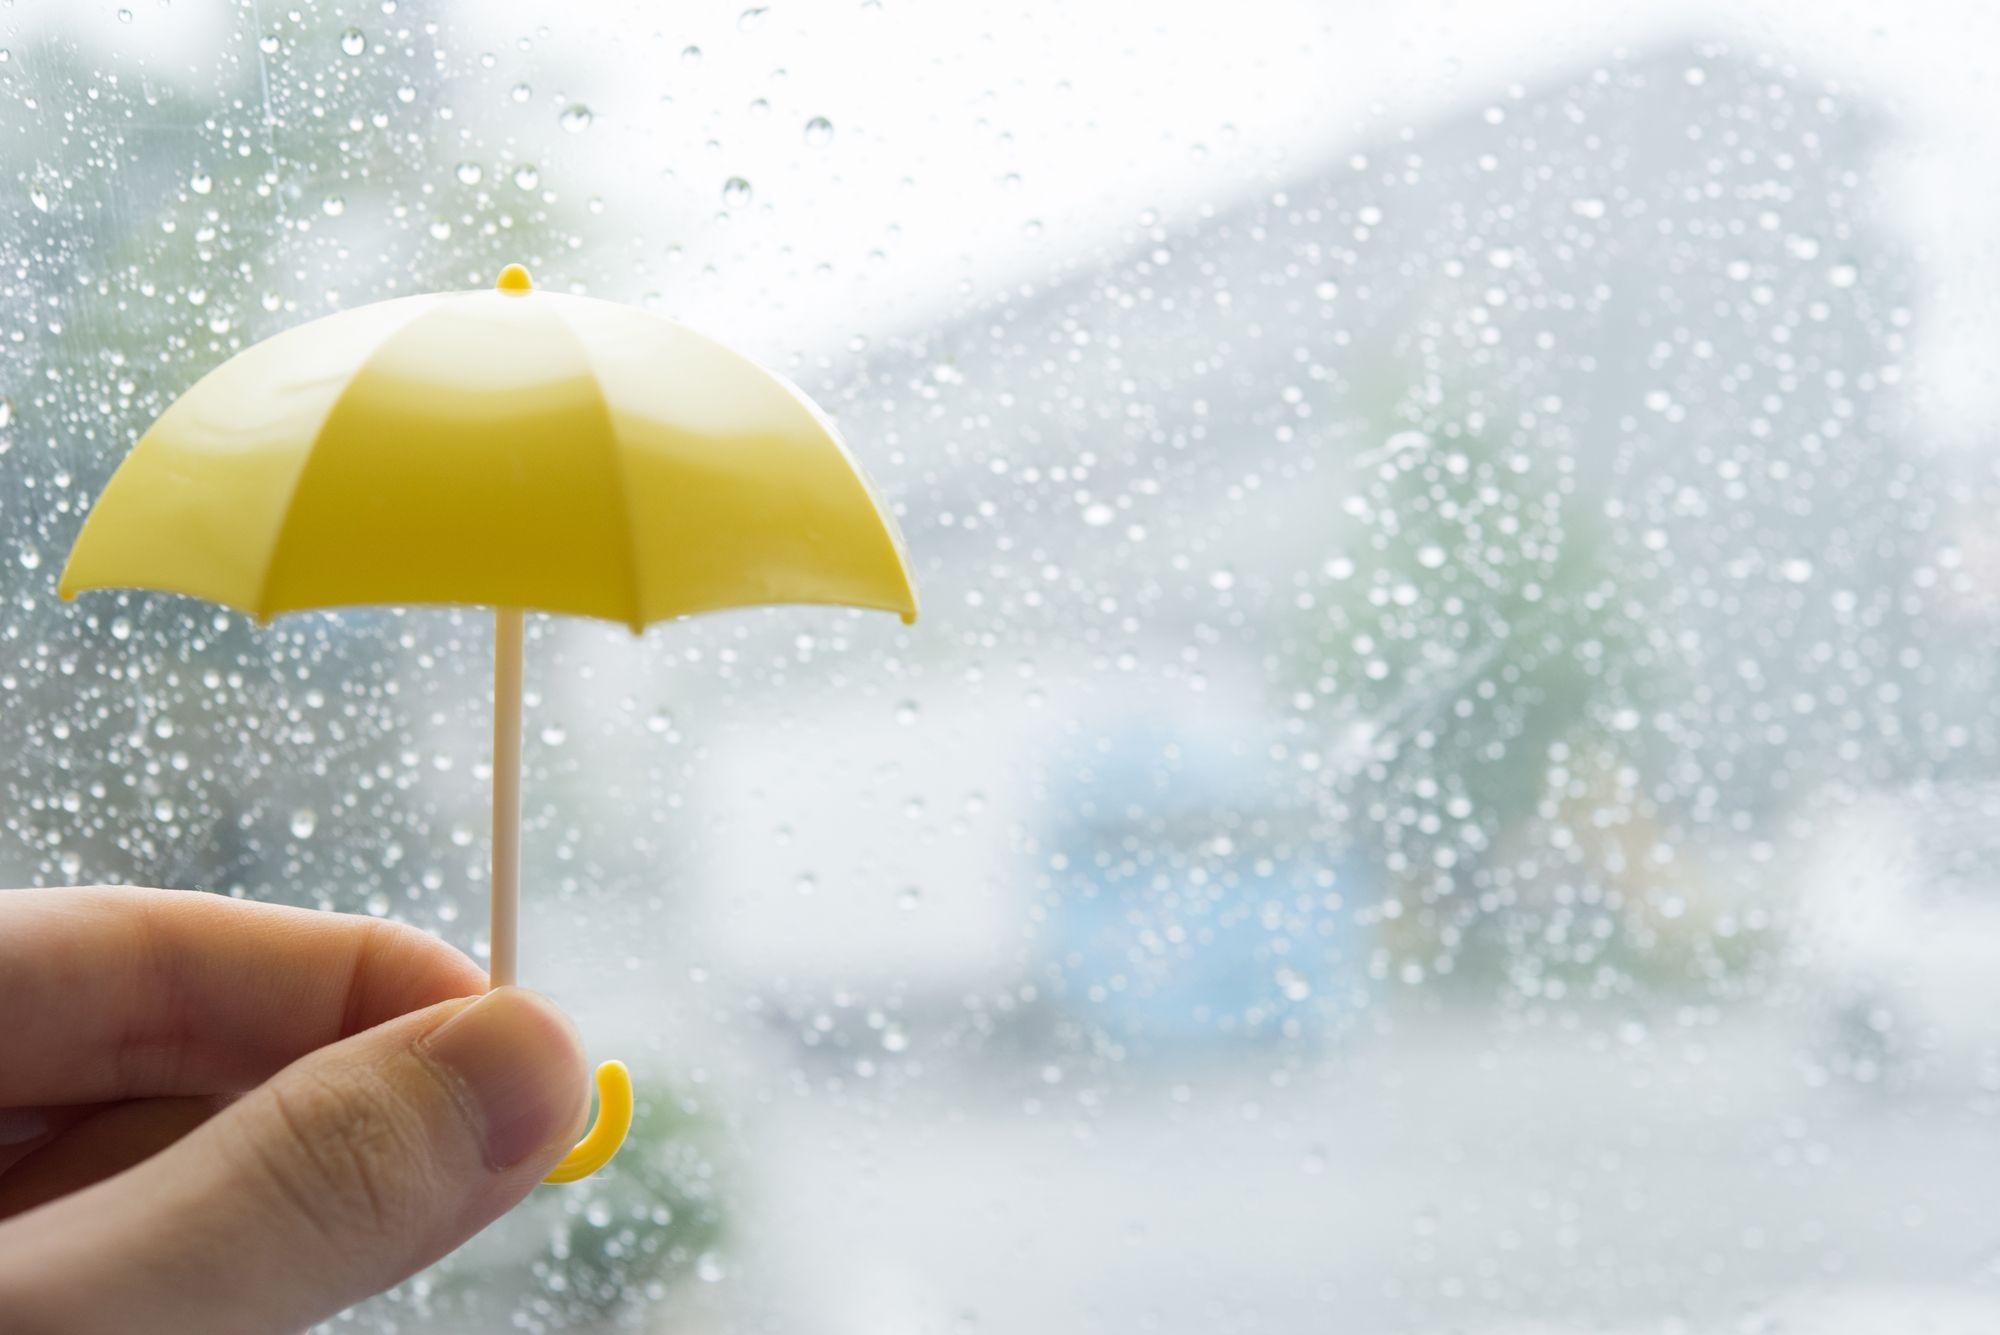 Japan's rainy season